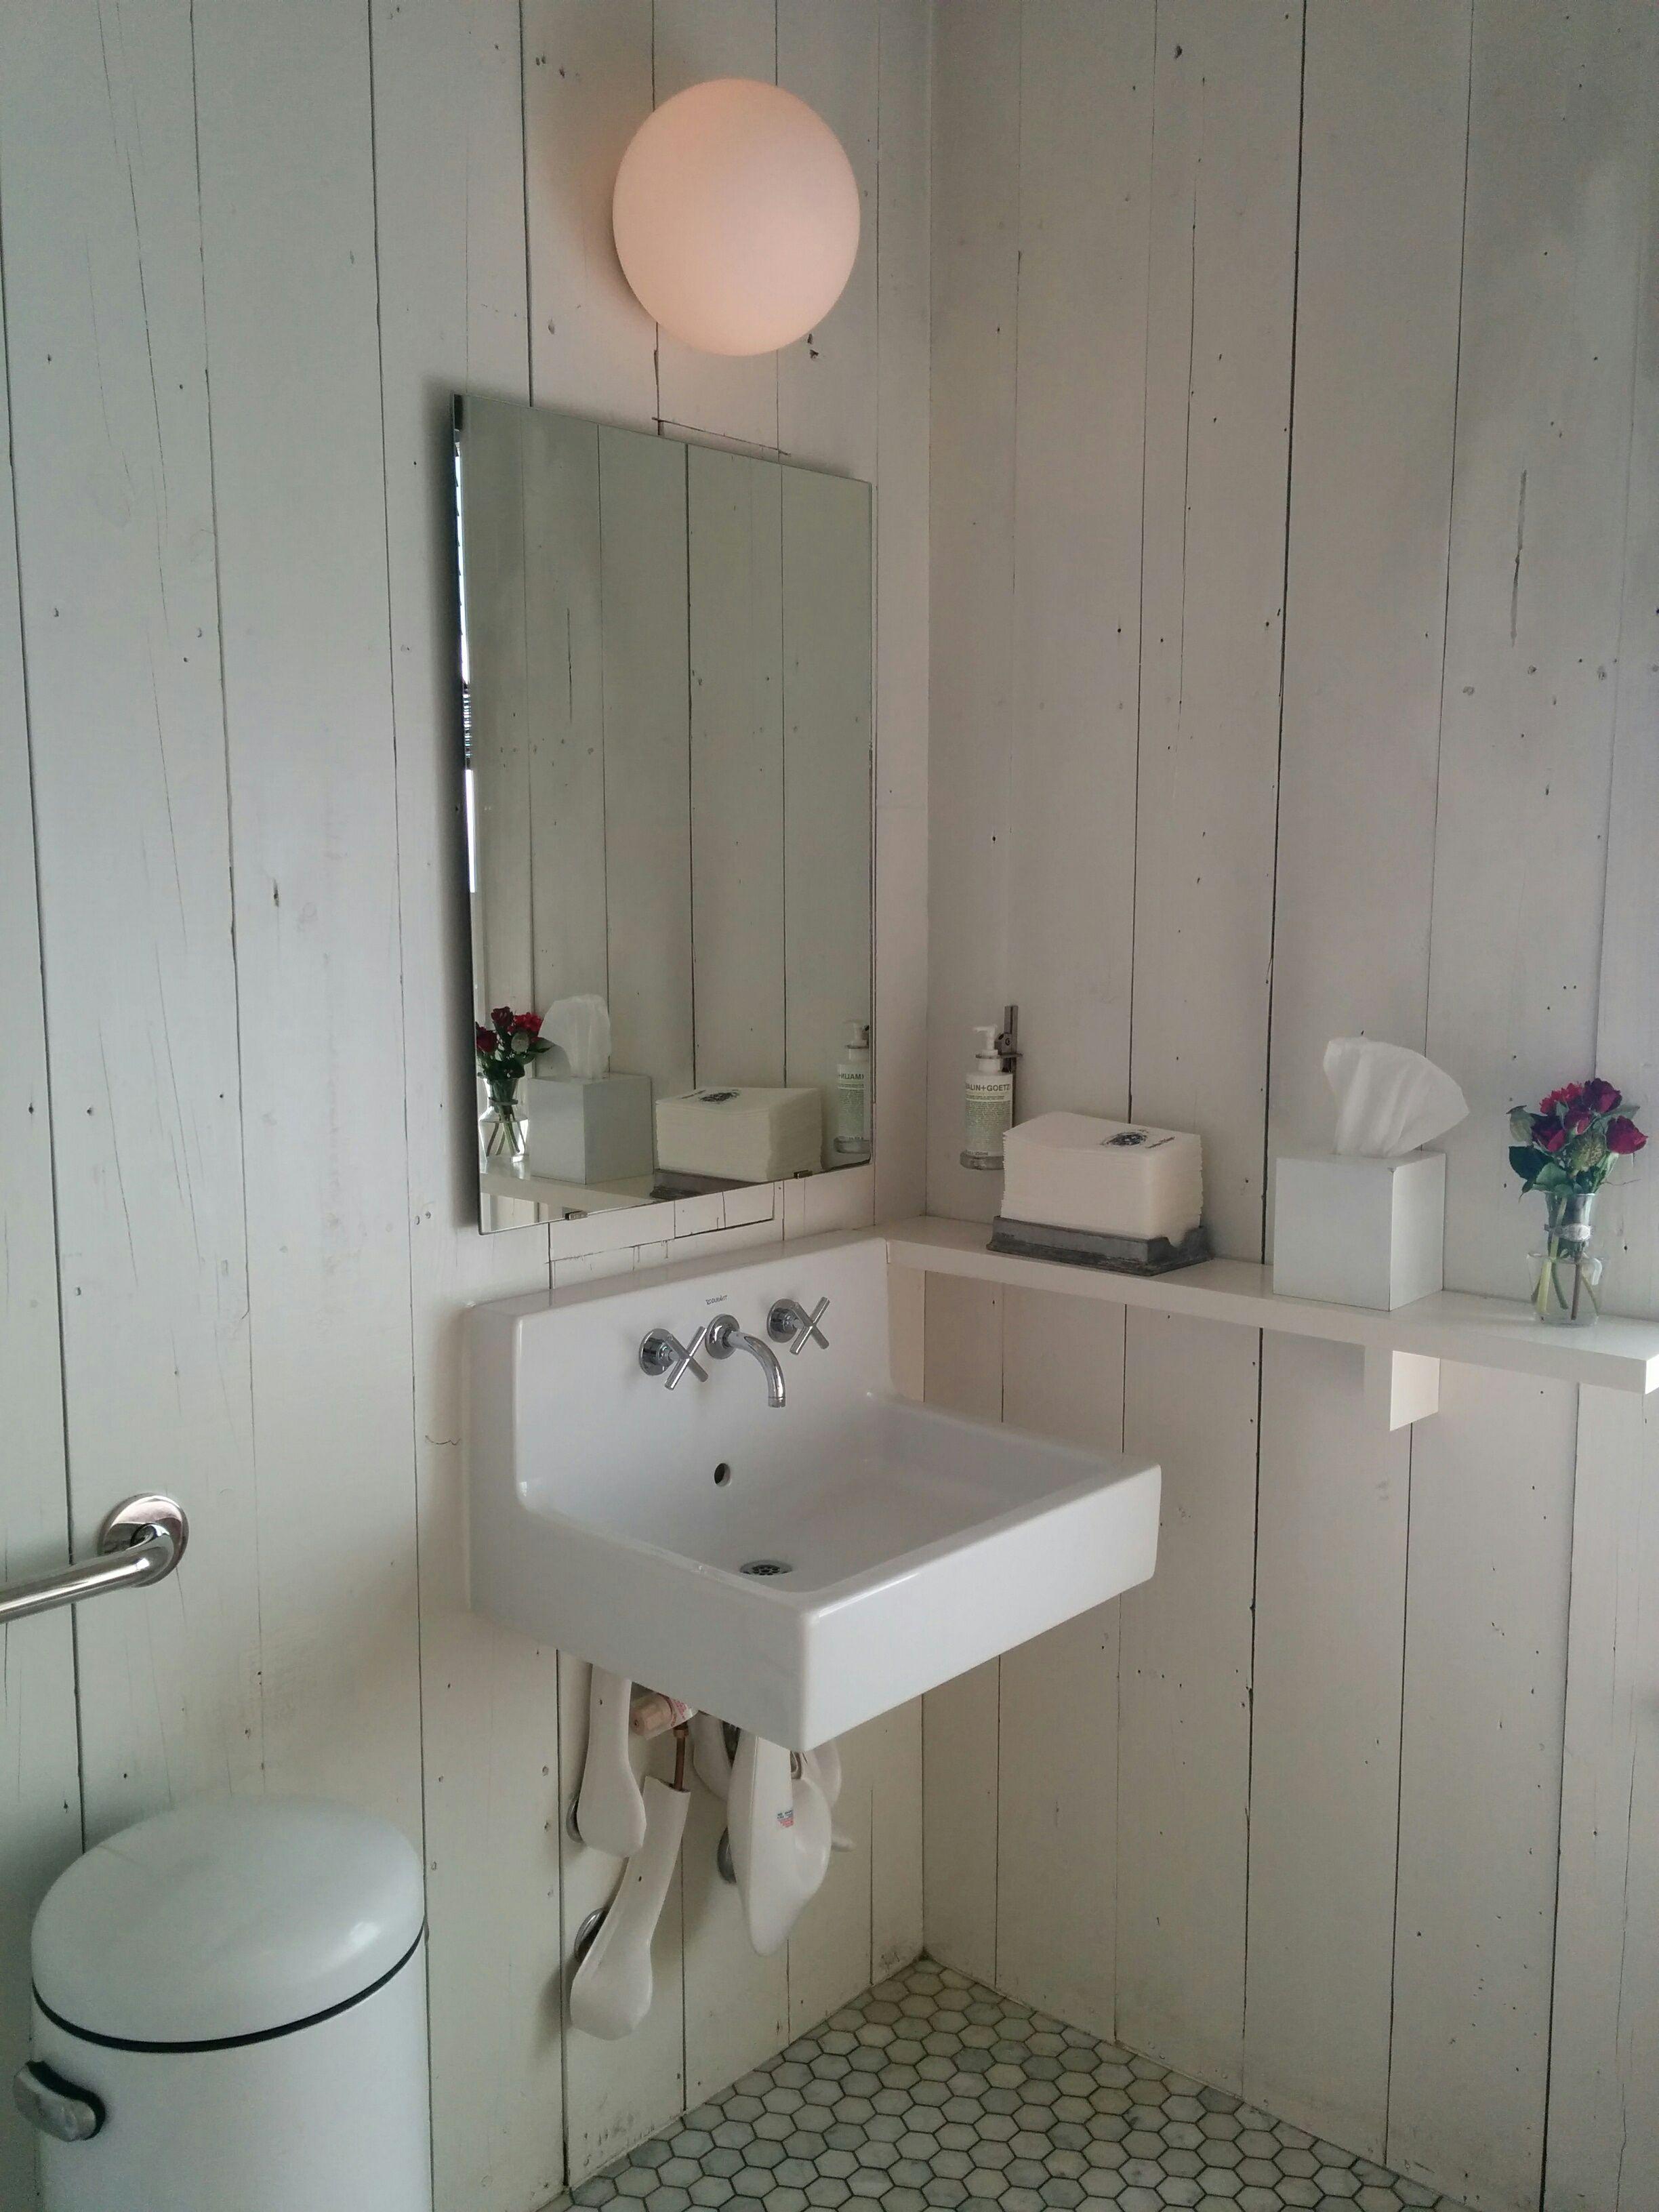 Bathroom Design Austin josephine house, austin, tx bathroom design   bathroom flair